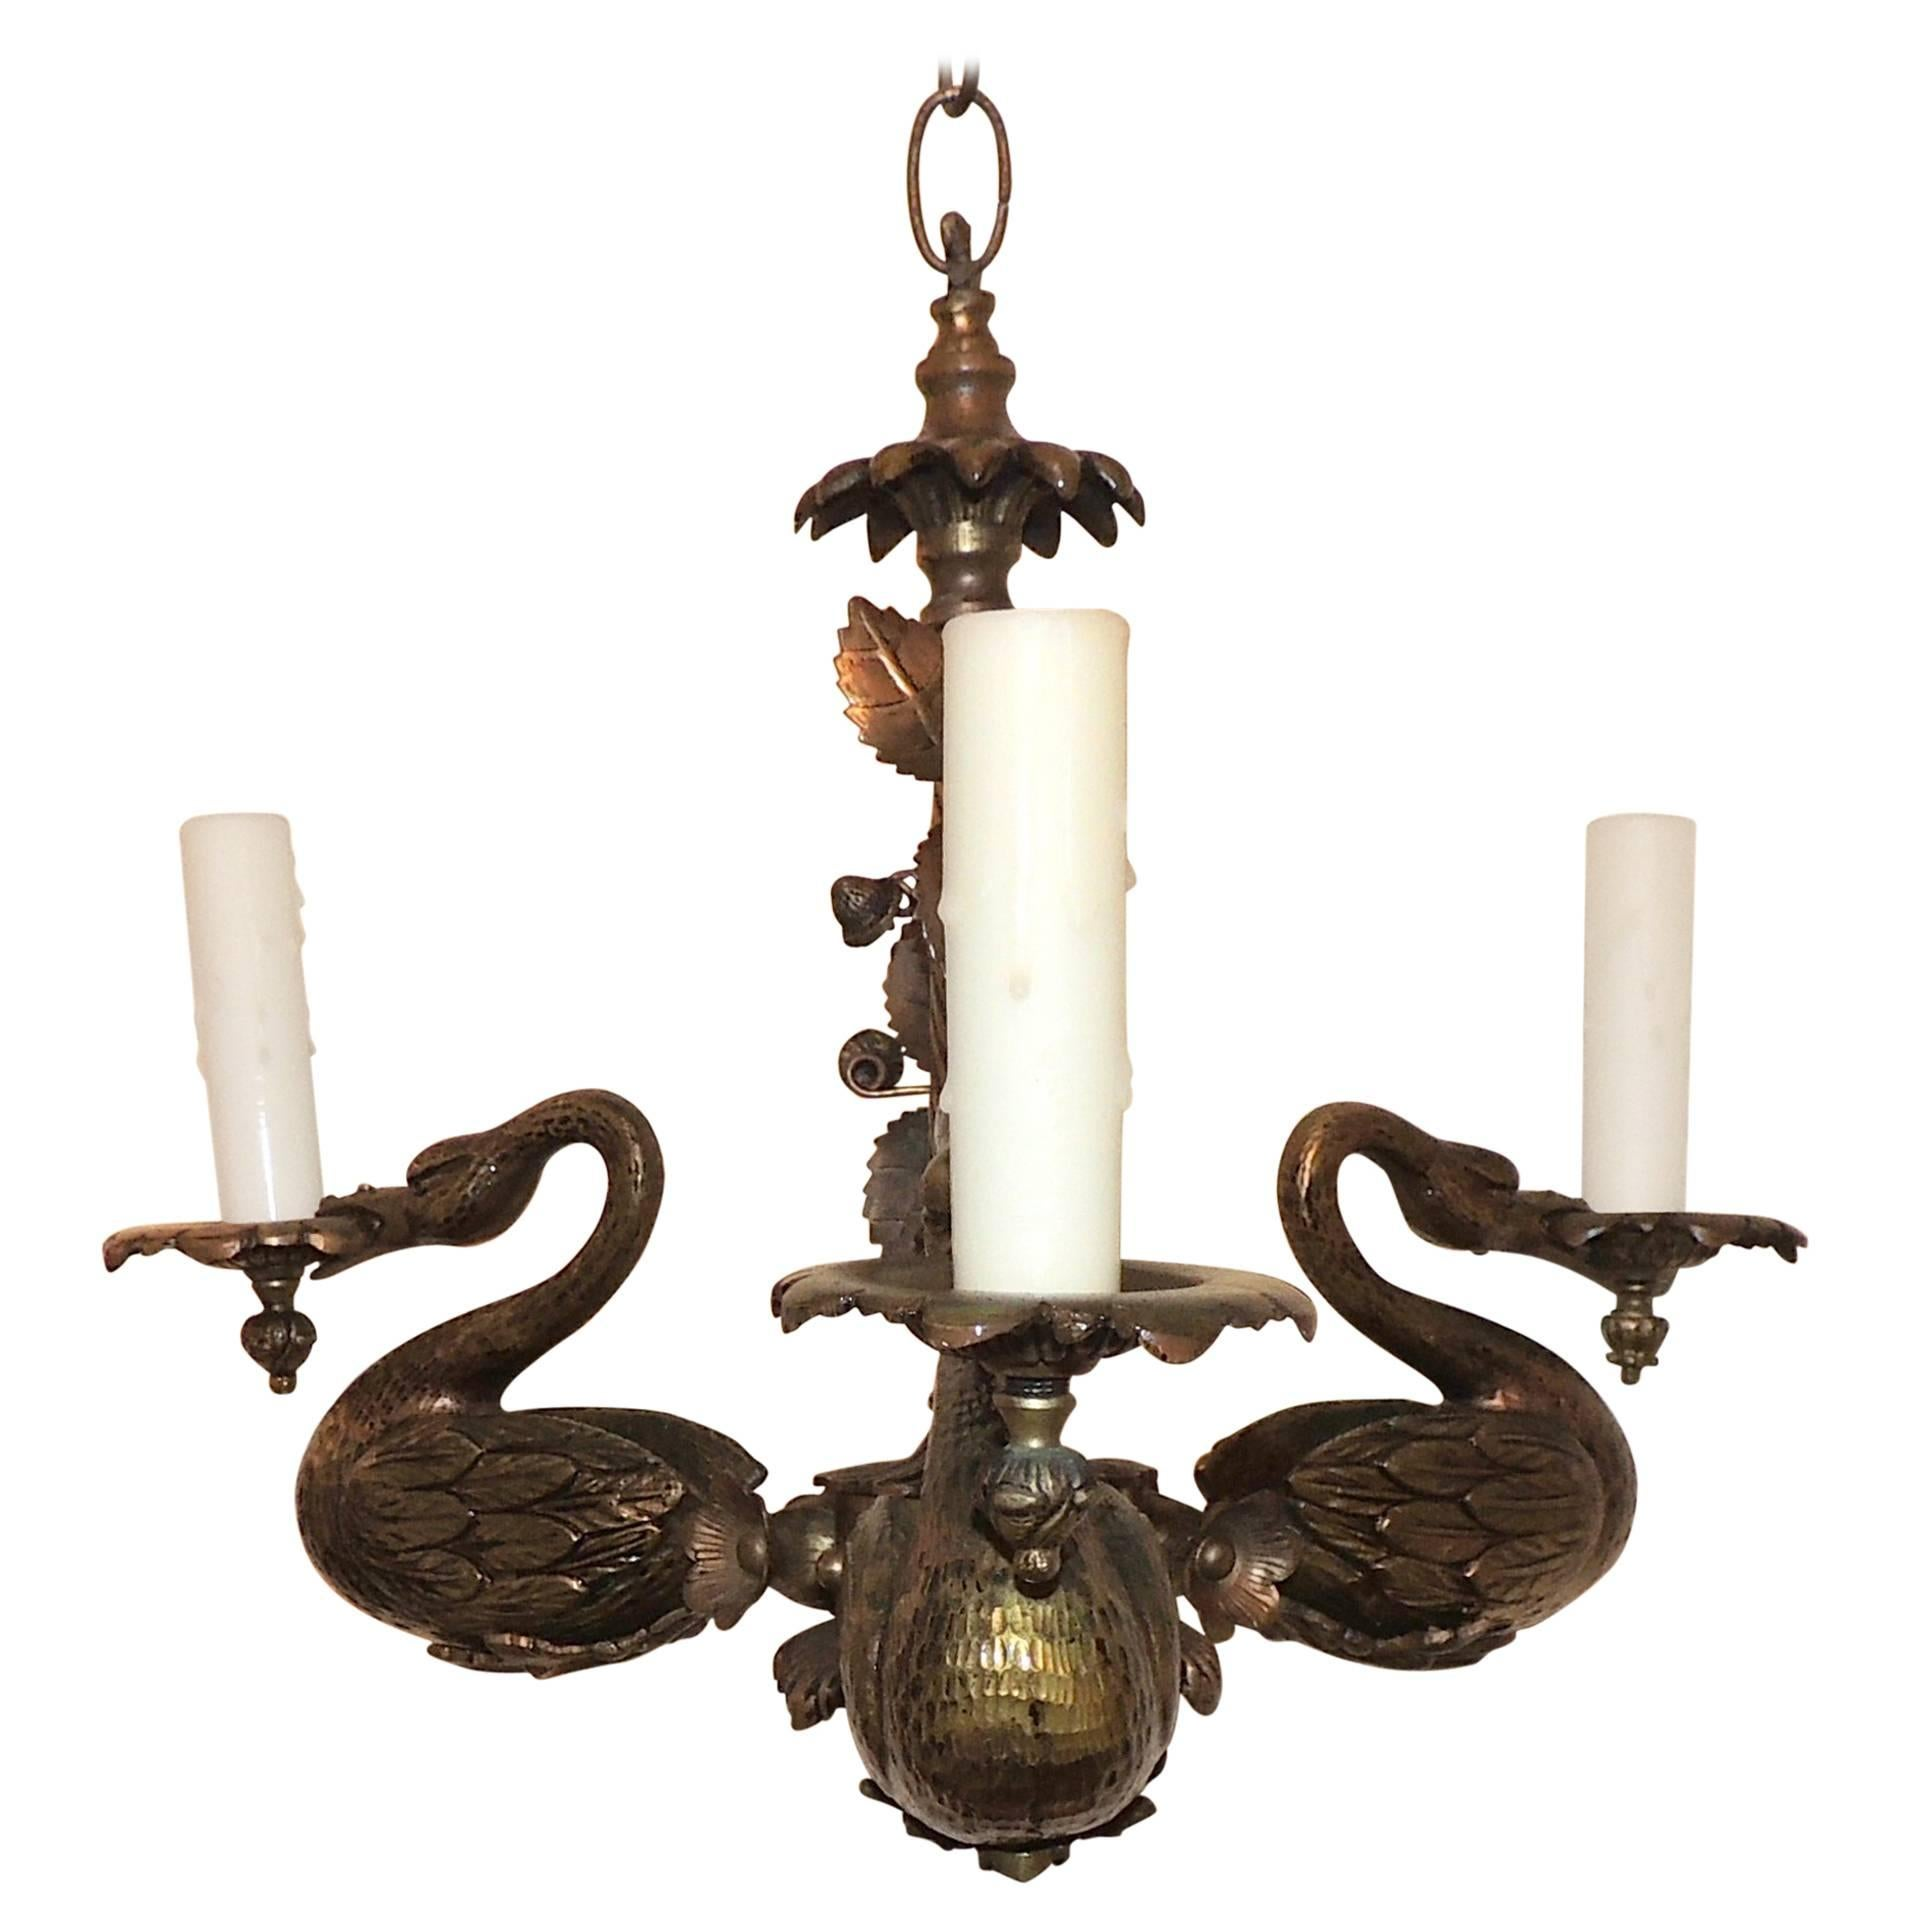 Wonderful French Empire Neoclassical Gilt Bronze Swan Regency Chandelier Fixture